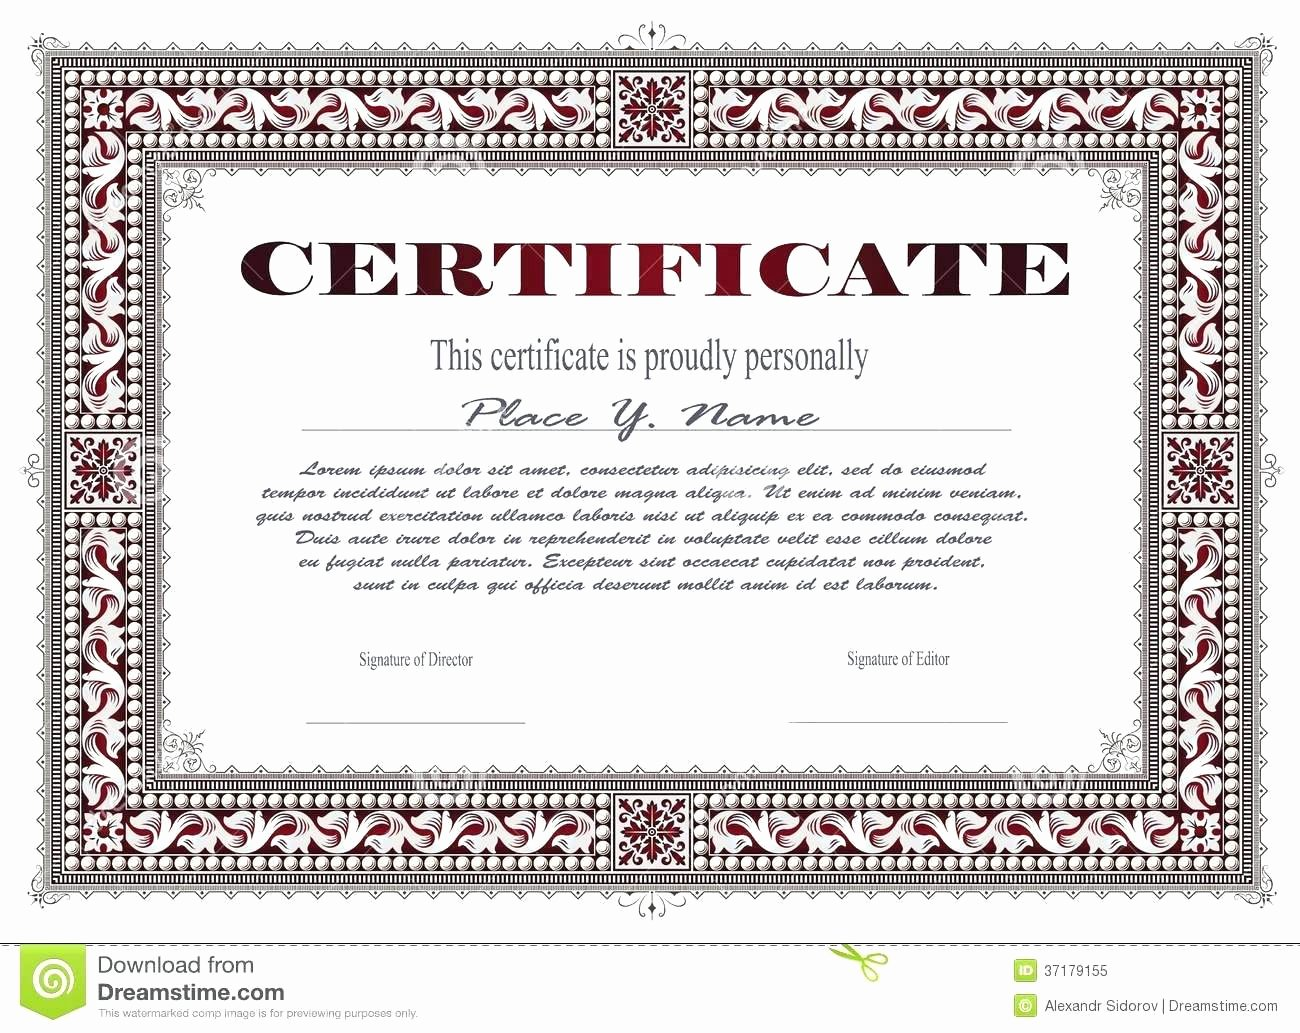 Llc Stock Certificate Template New Template Corporation Stock Certificate Template